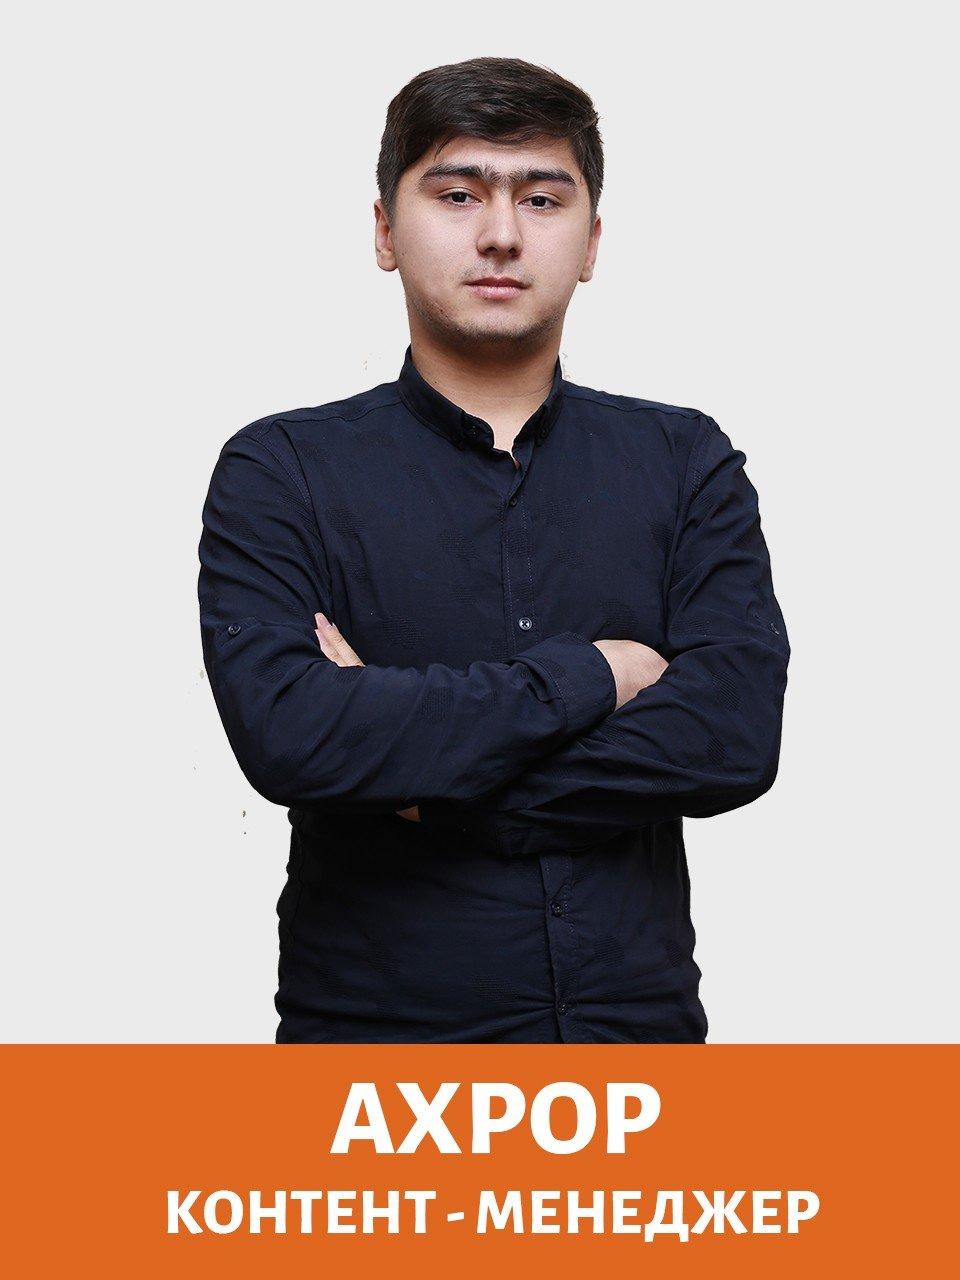 ahror kontent menedzher - Сделать сайт